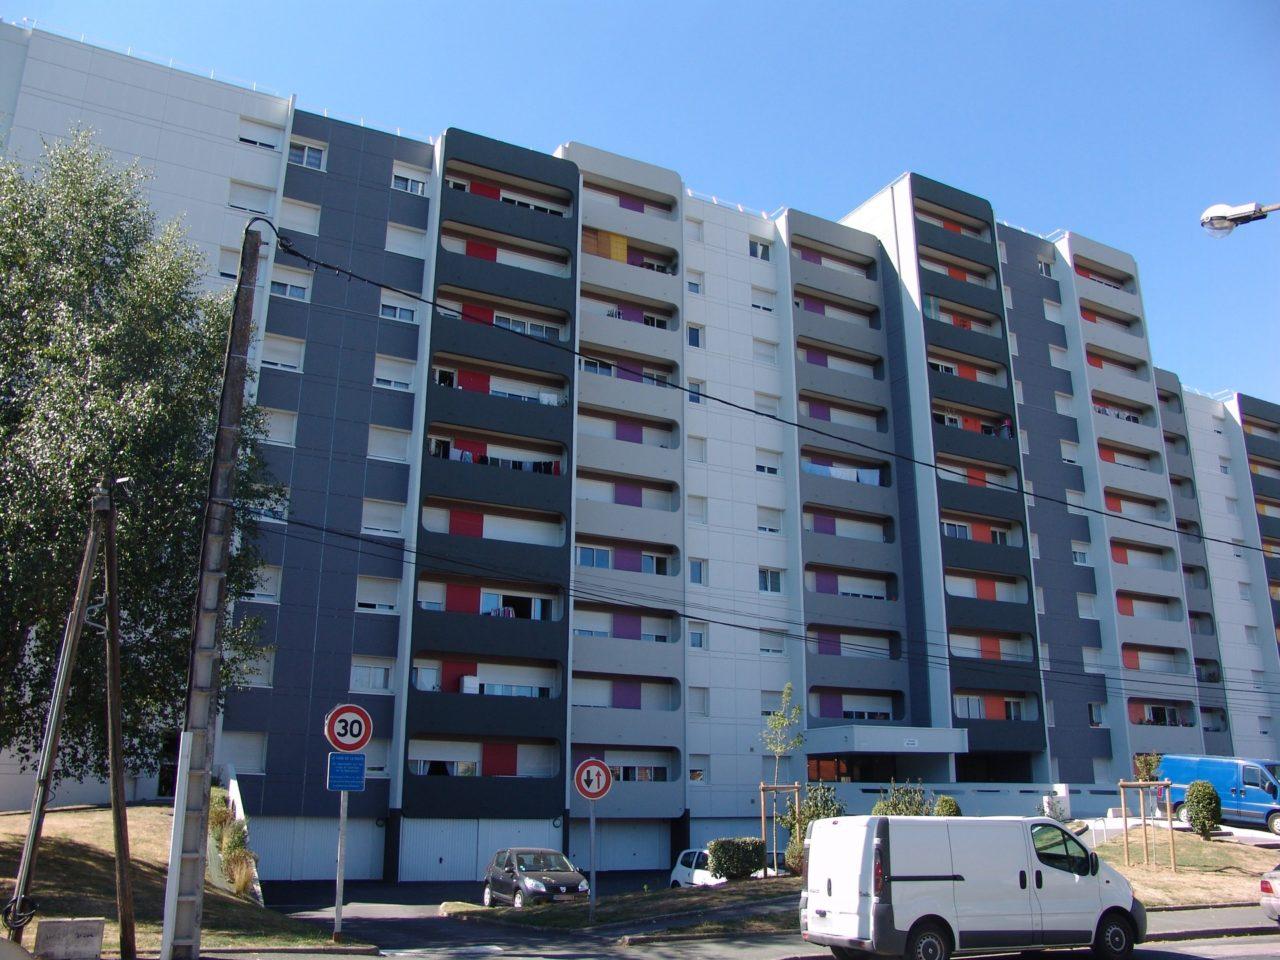 Residence bretagne vend e habitat for Garage phelippeau la roche sur yon